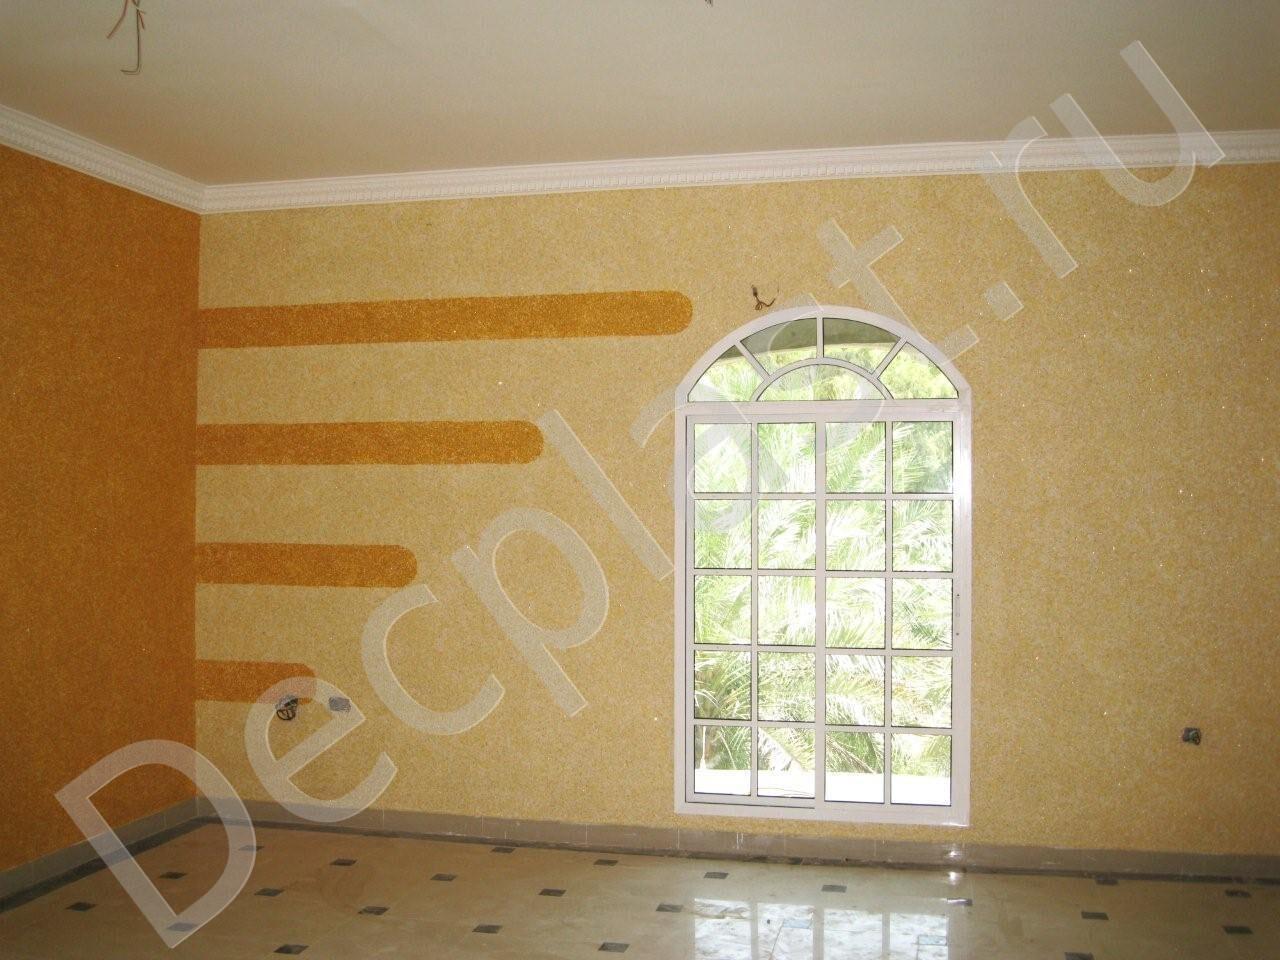 Отделка стен в квартире - фото идеи красивого оформления от дизайнеров